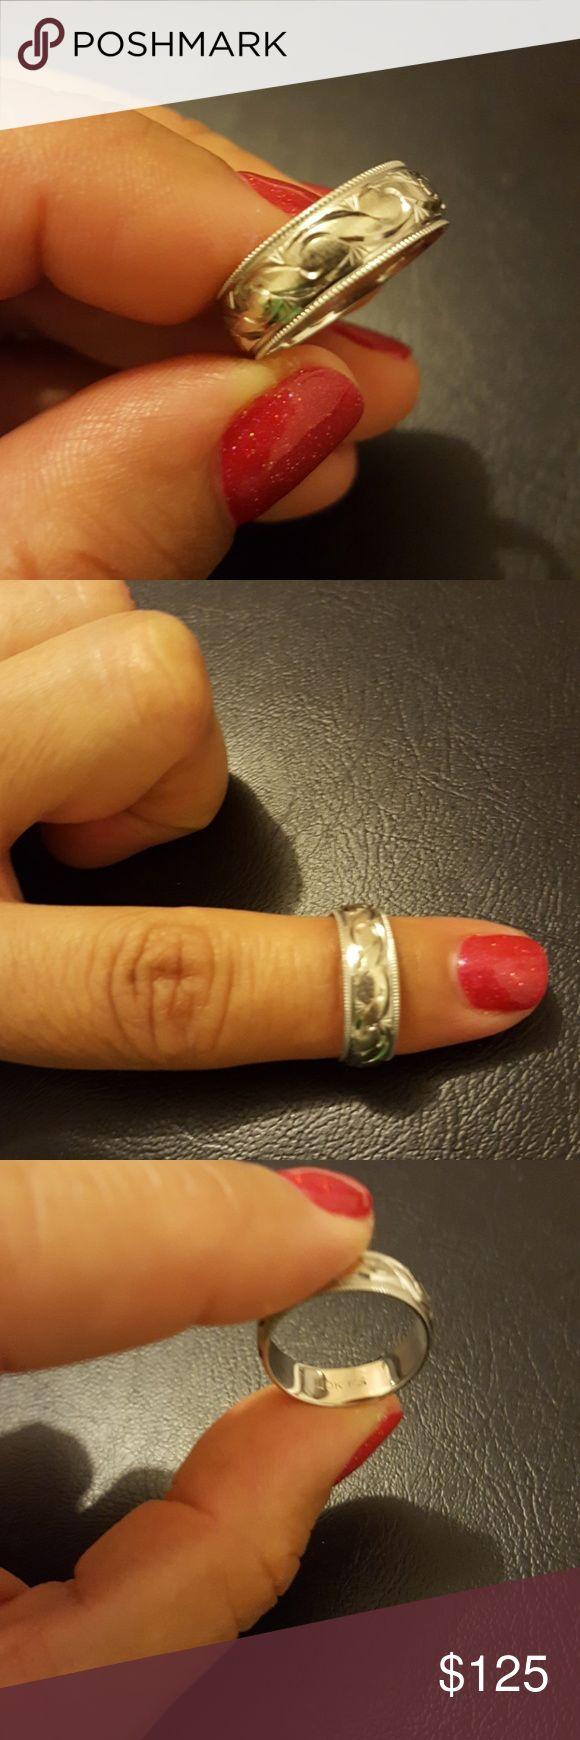 Ladies Engraved Ring Lovely 10 karat white gold engraved ring Zales Jewelry Rings